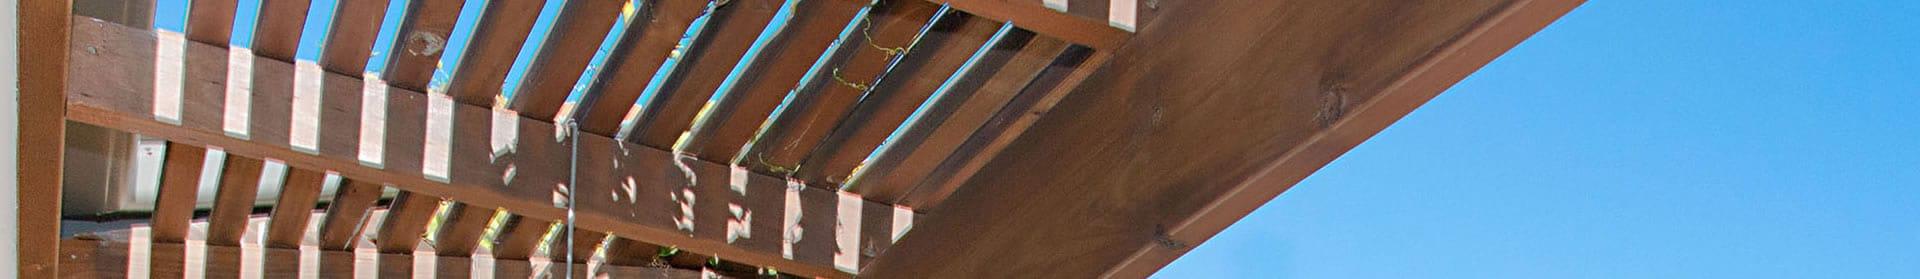 Designer Decks